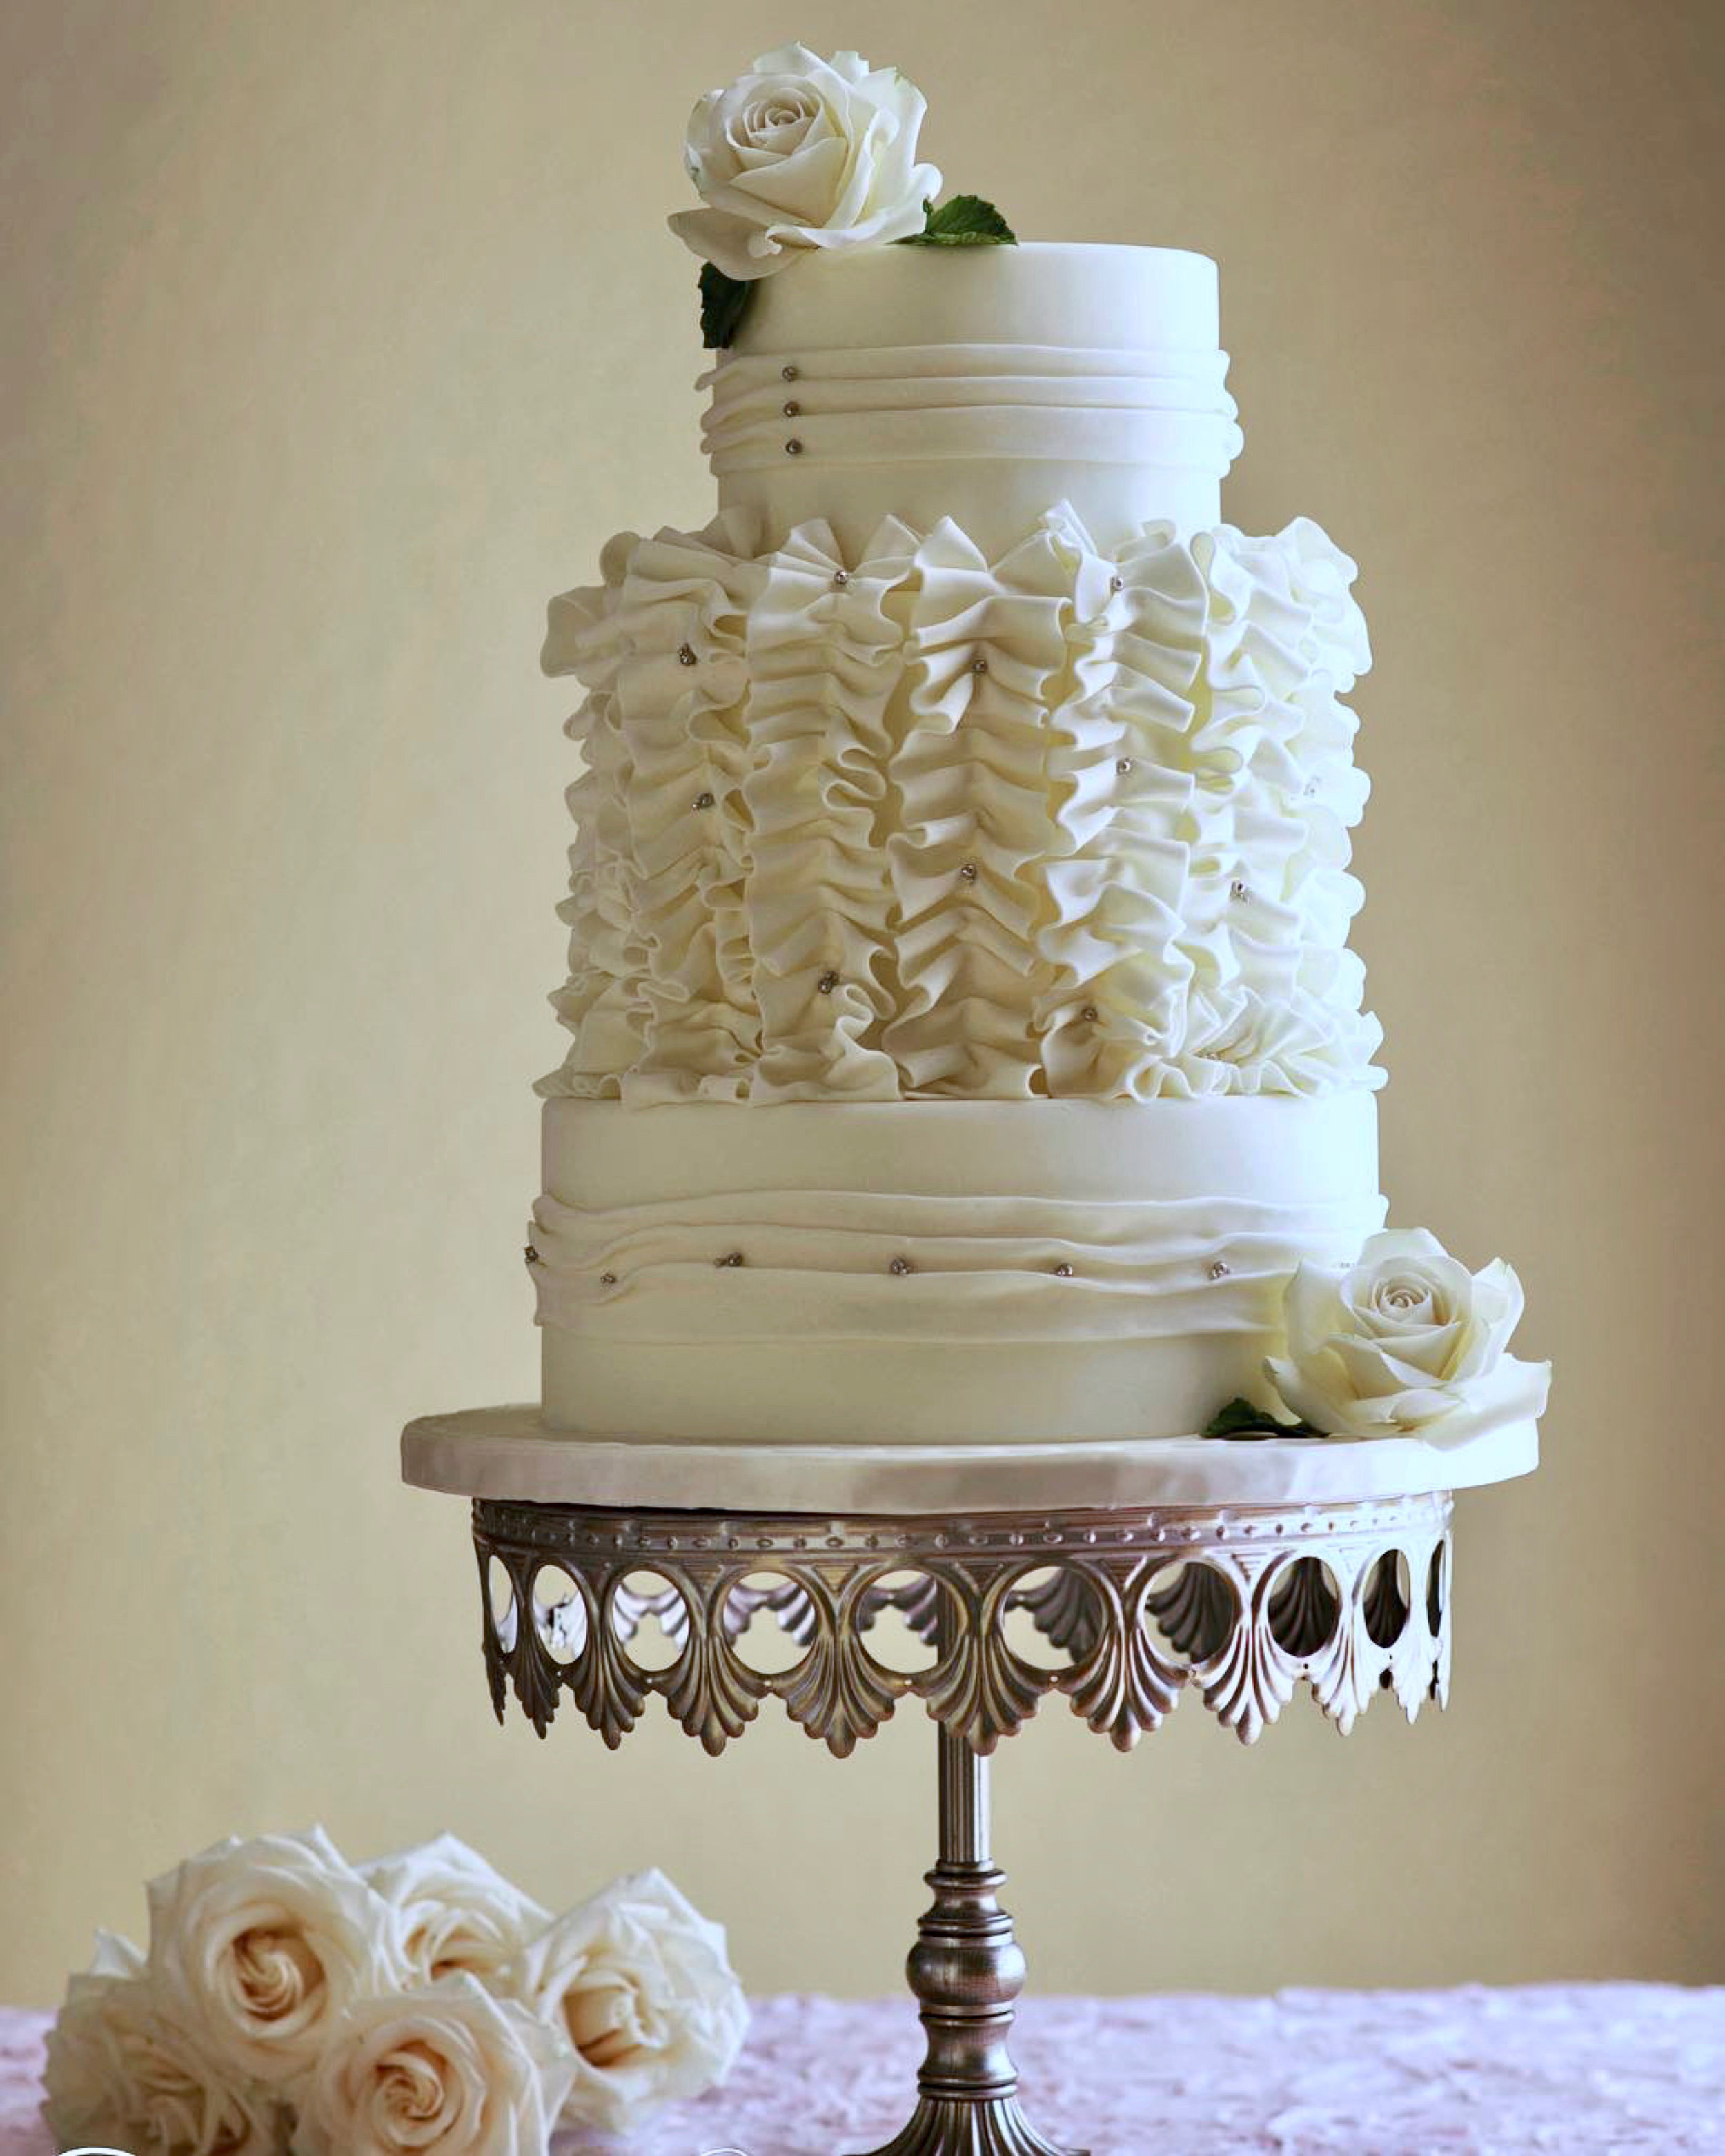 antique-silver-crown-cake-stand-opulent-treasures-wedding-cake.jpg